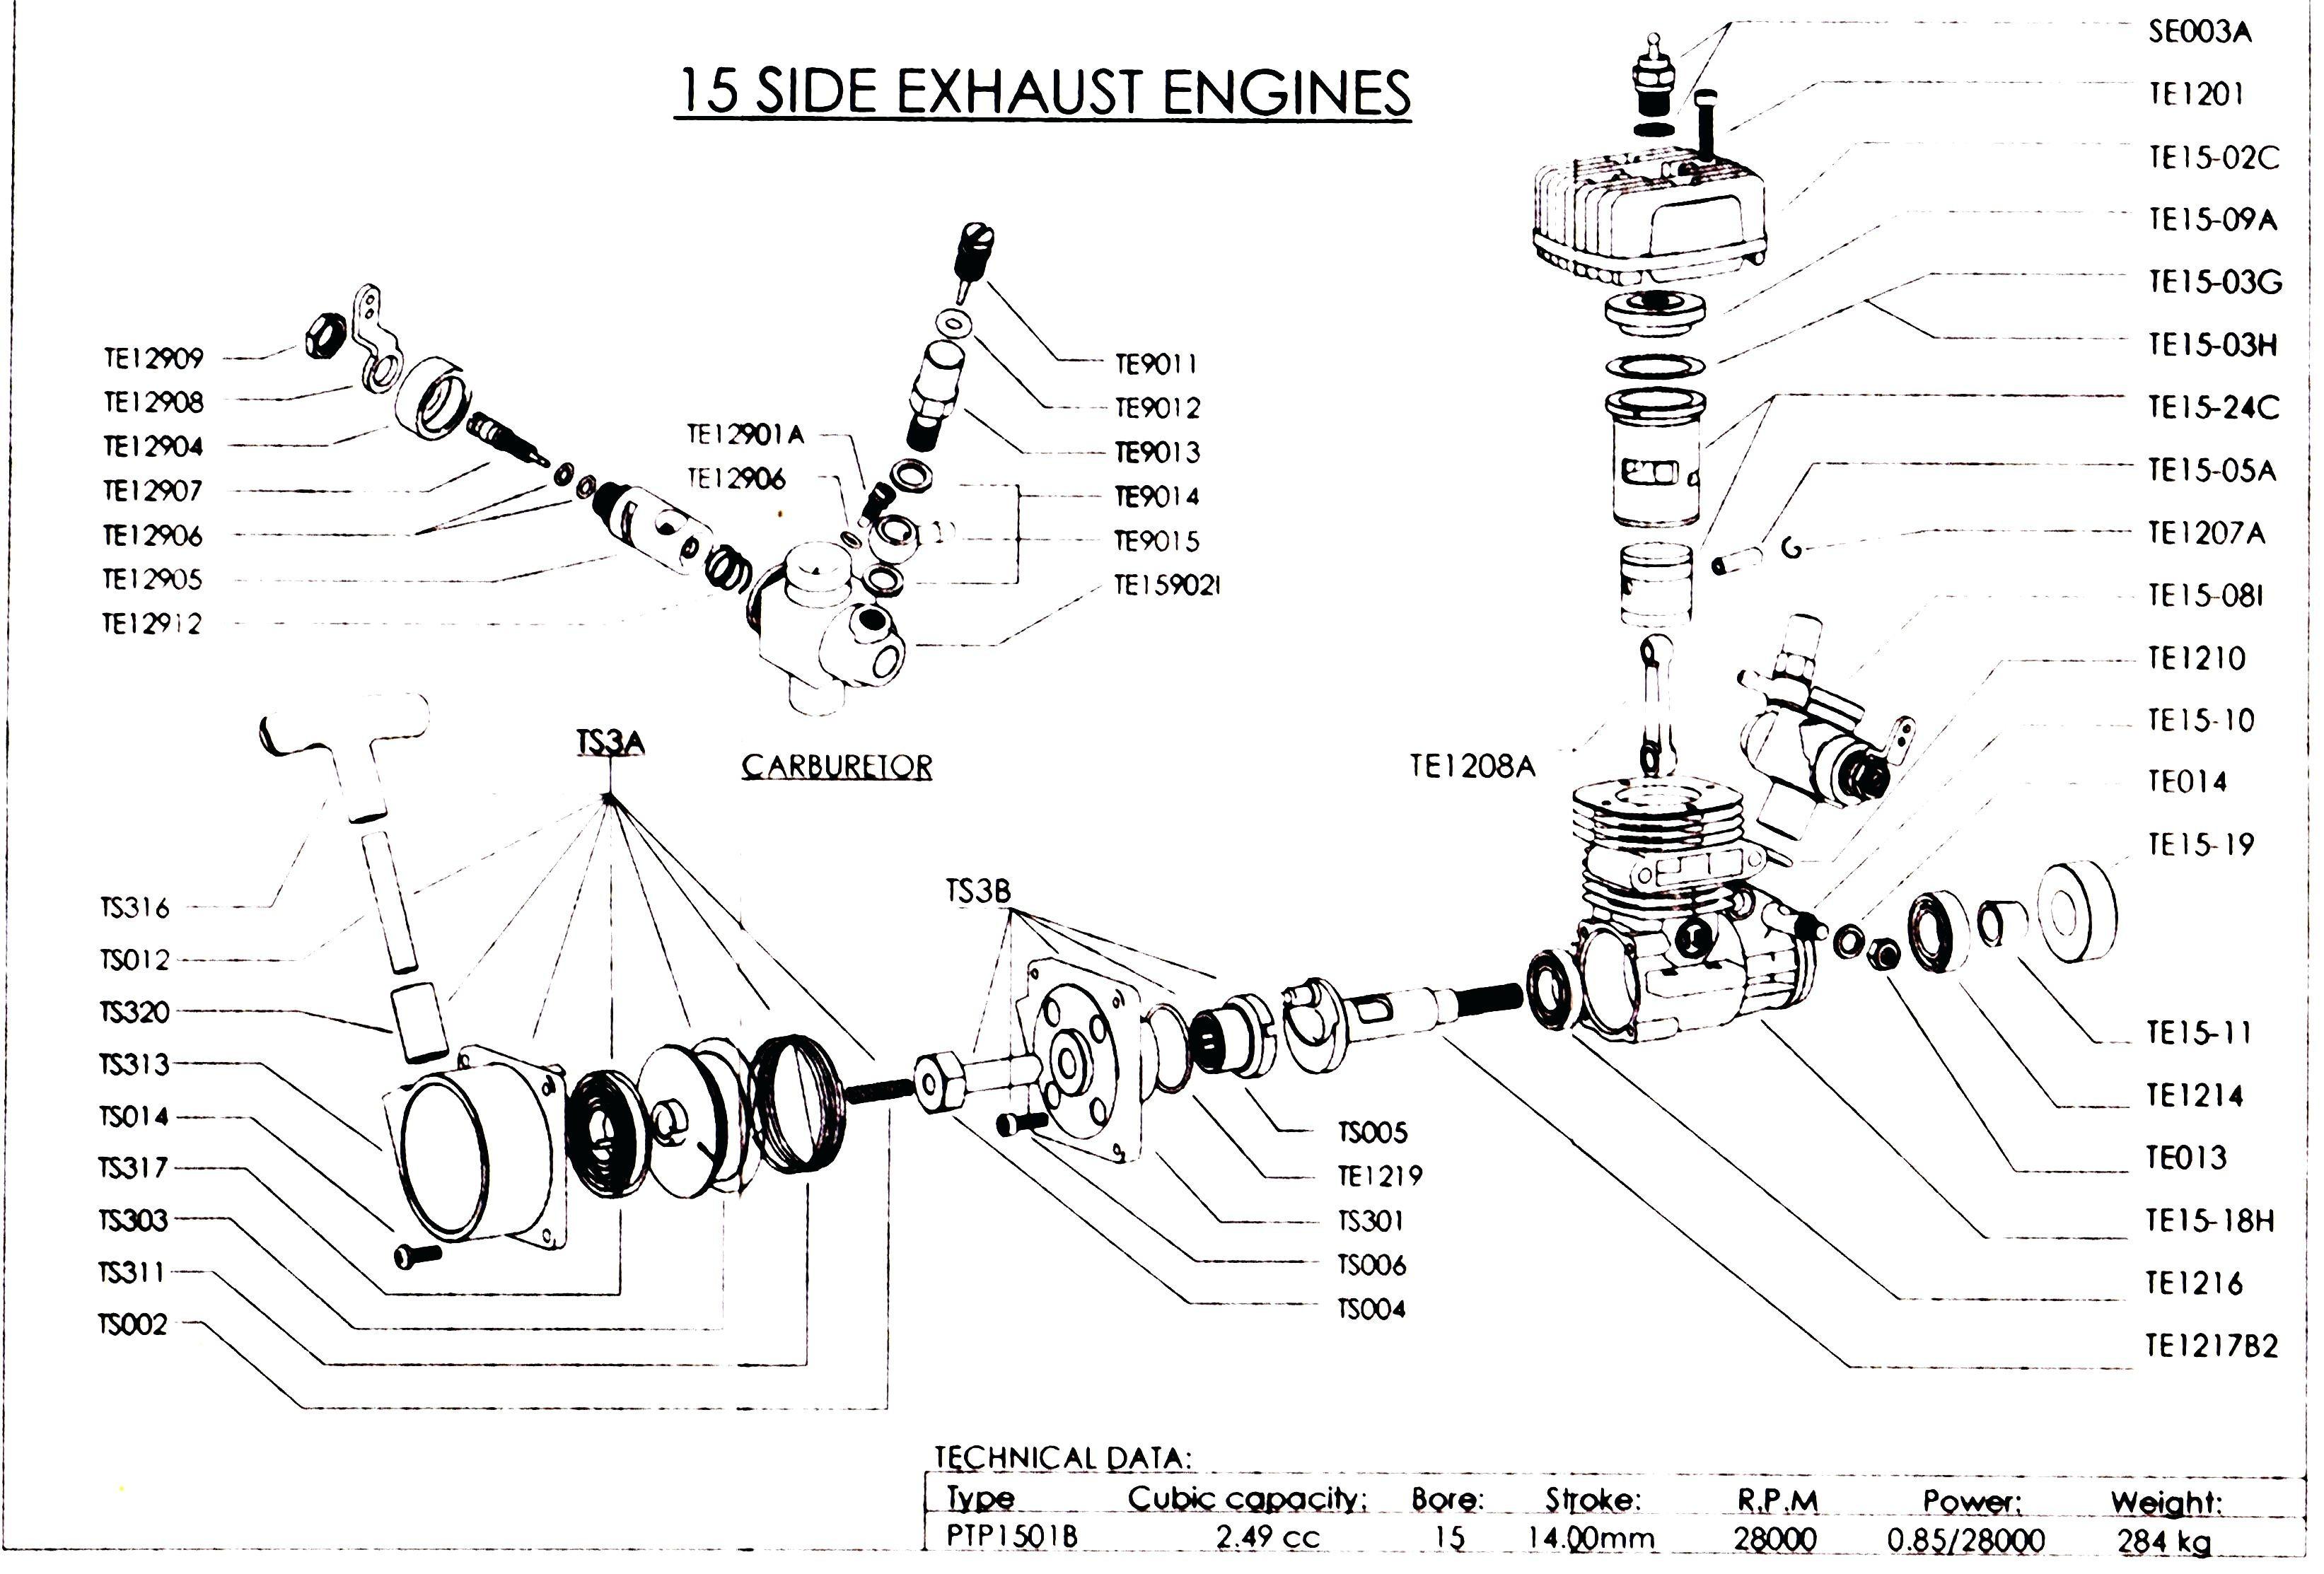 rc car wiring diagram ladder wiring diagrams best rc car wiring diagram ladder wiring library rc car battery rc car circuit board diagram car